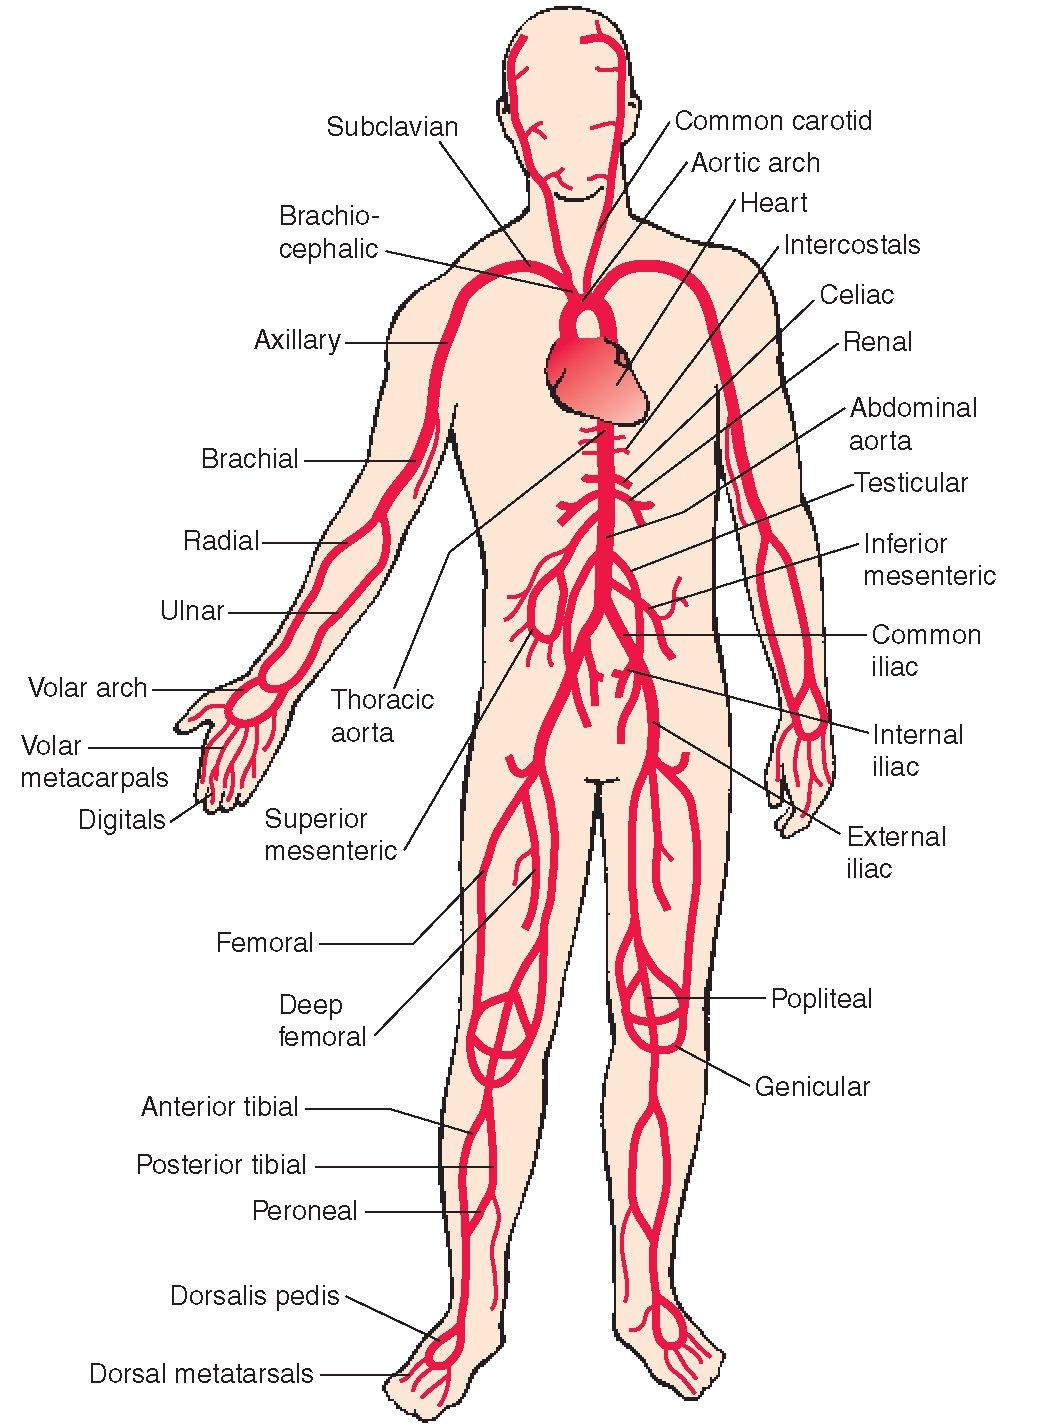 بالصور جسم الانسان بالصور , اكتشف ما في داخل جسمك بالصور 1291 8